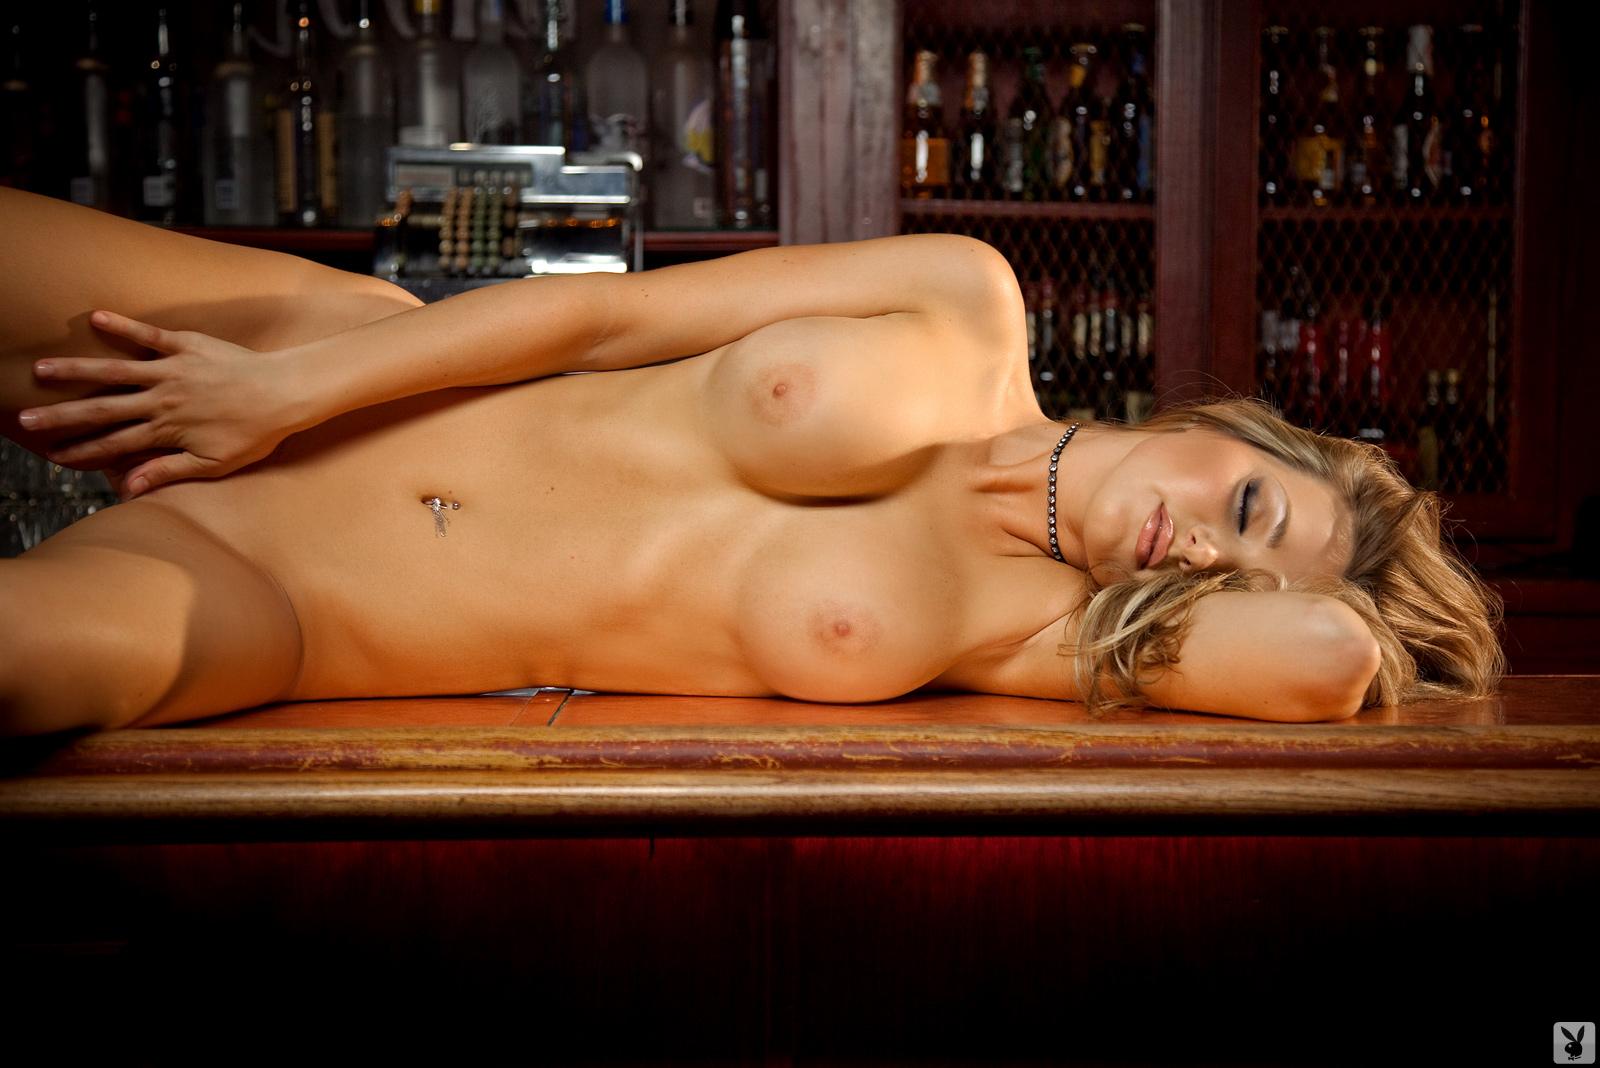 Daniella mugnolo nude photographs was specially